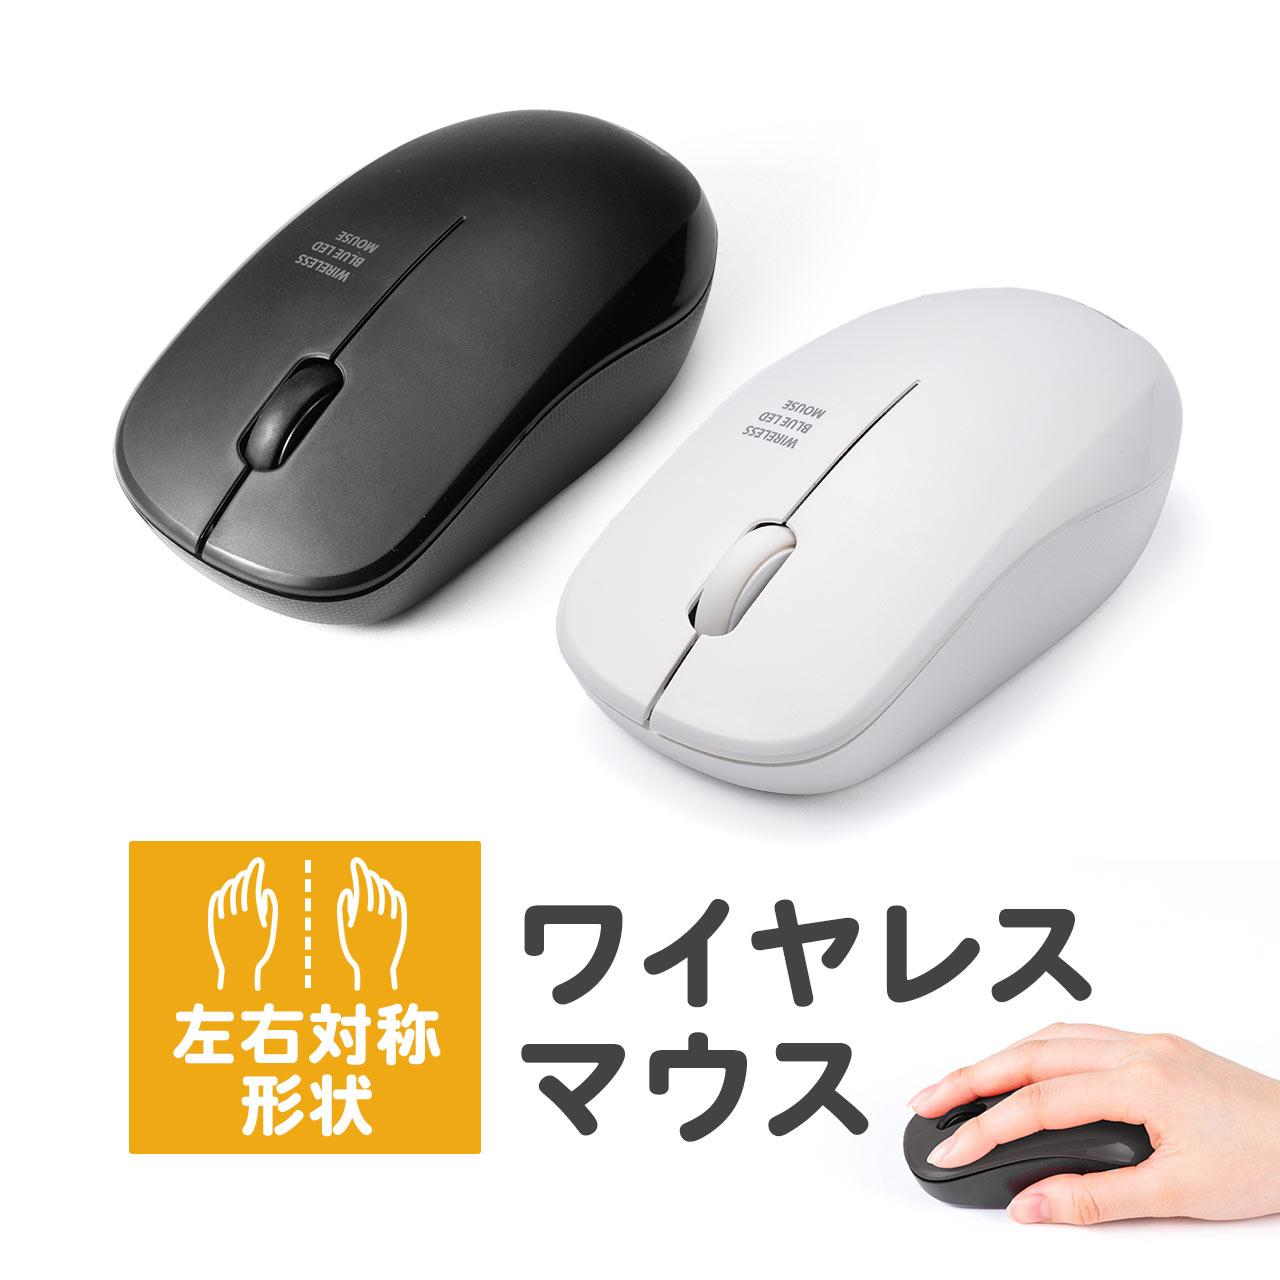 [400-MA136]【サンワダイレクト限定品】【掘り出しモノ】 ワイヤレスマウス ブルーLEDマウス マウス コンパクトマウス 3ボタン 左右対称 1200カウント レシーバー収納 電池式 無線マウス ワイヤレス 無線 おしゃれ